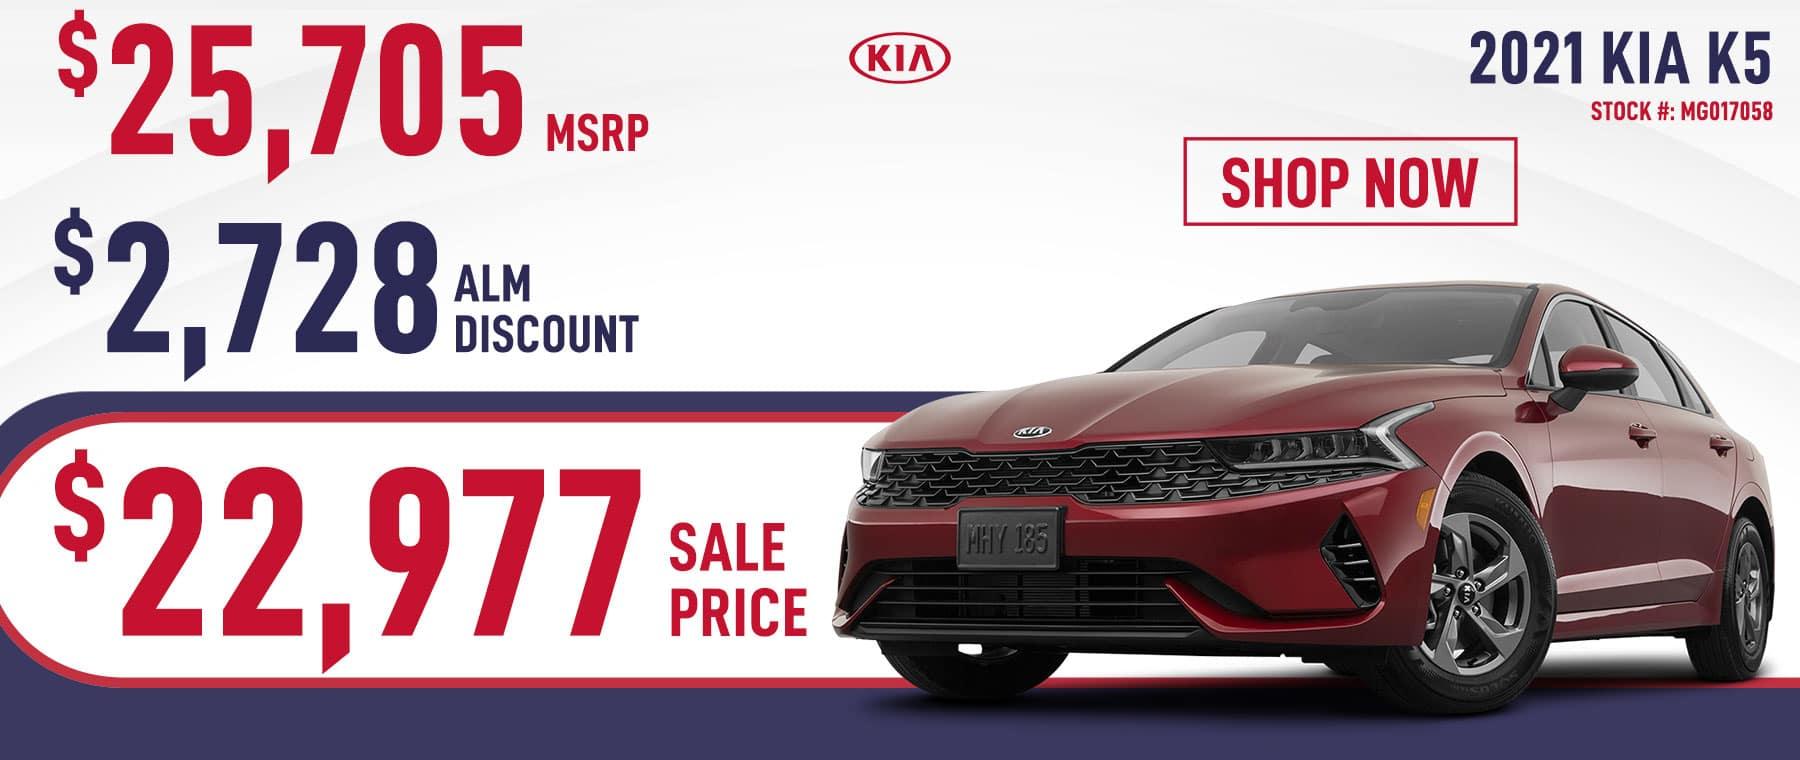 2021 Kia K5 Sale Price $22,977